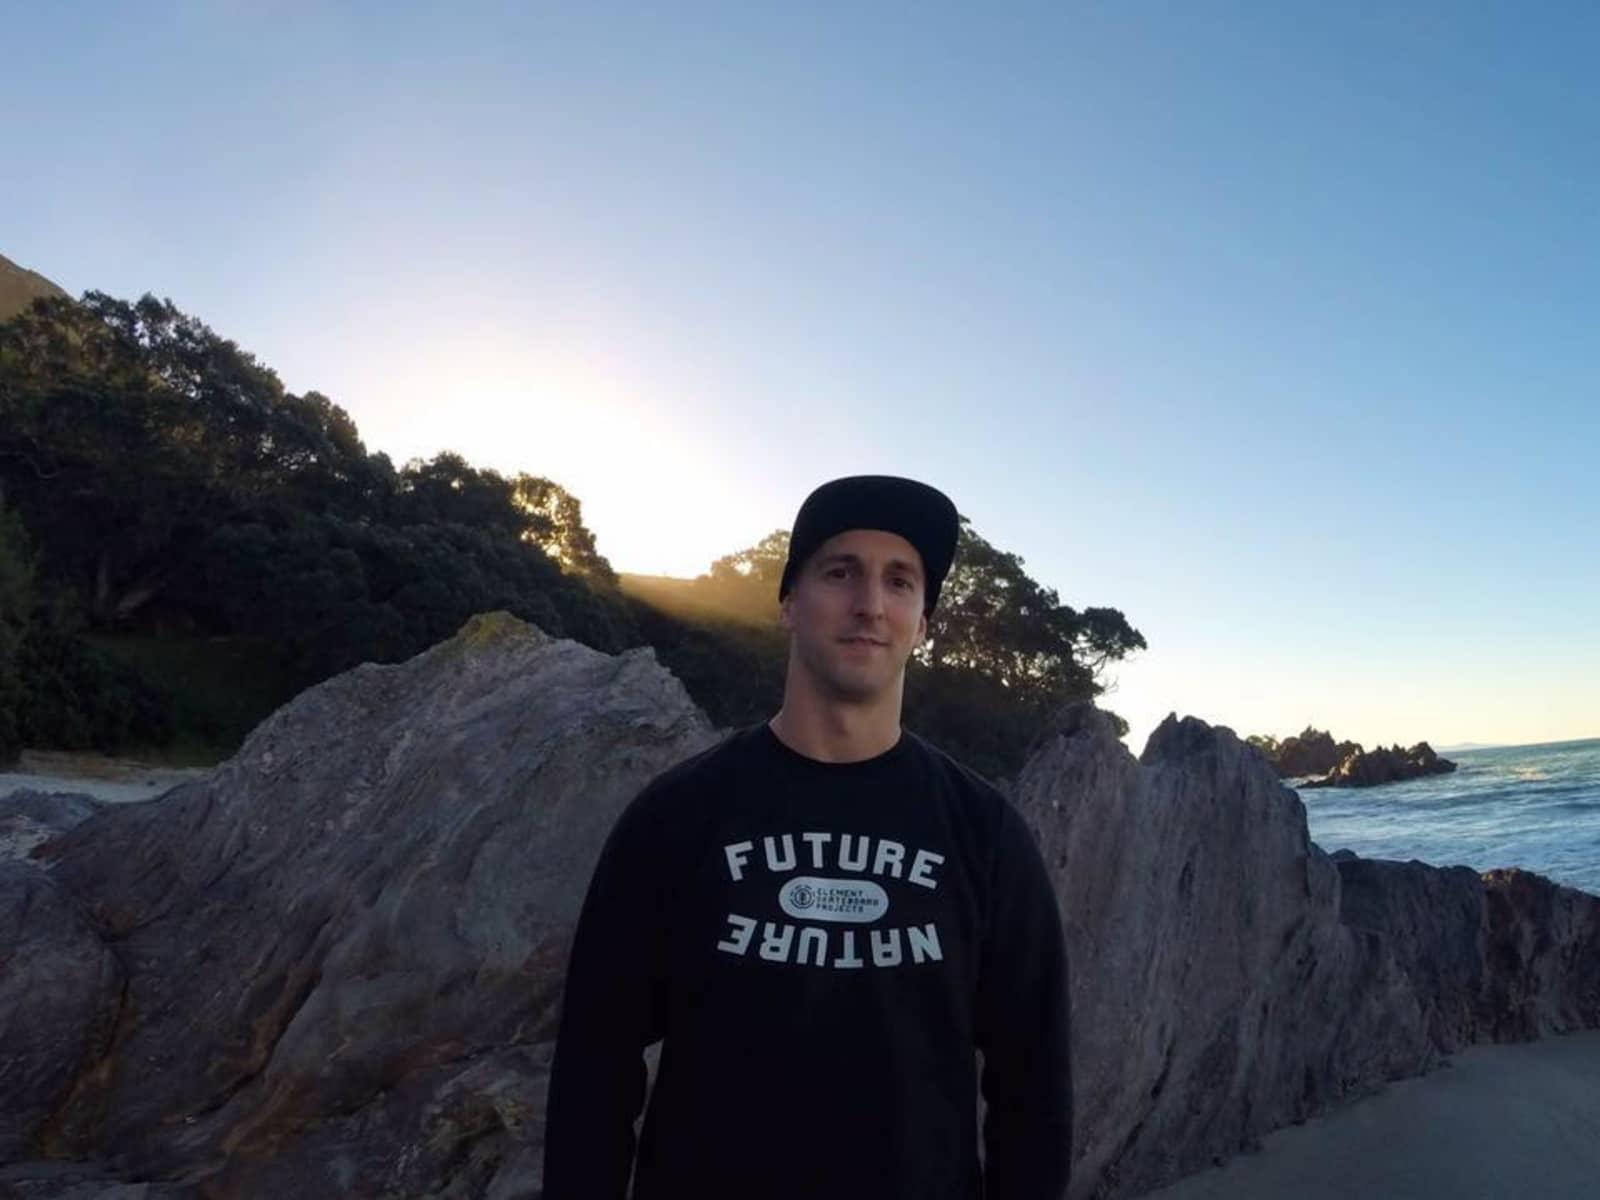 Dan from Auckland, New Zealand